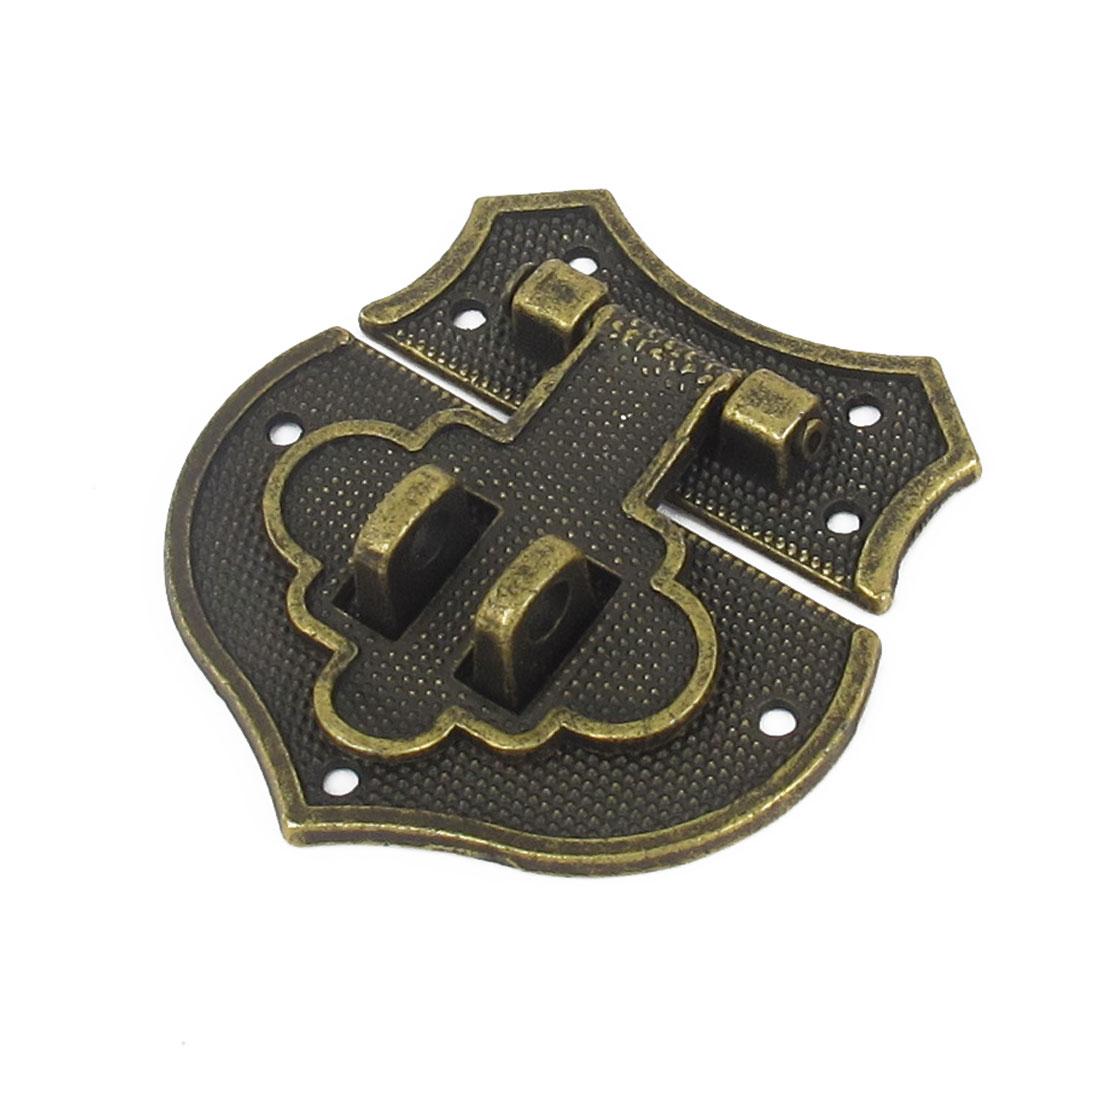 Bronze Tone Metal Antique Suitcase Jewelry Box Case Hasp Latch Chest Lock Locking Decor